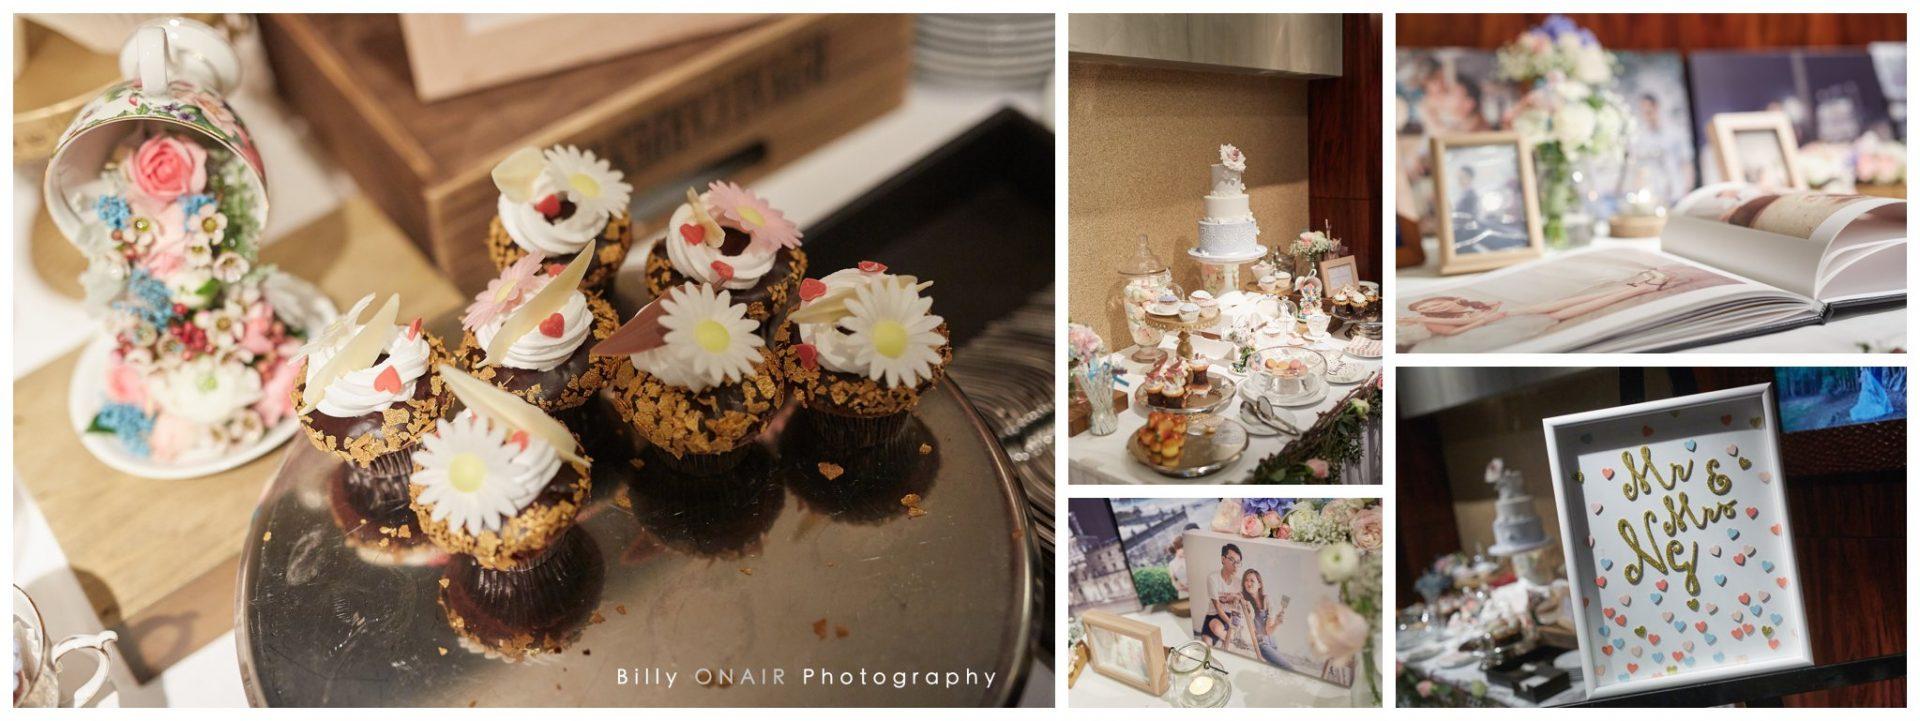 billy_wedding_photography_025